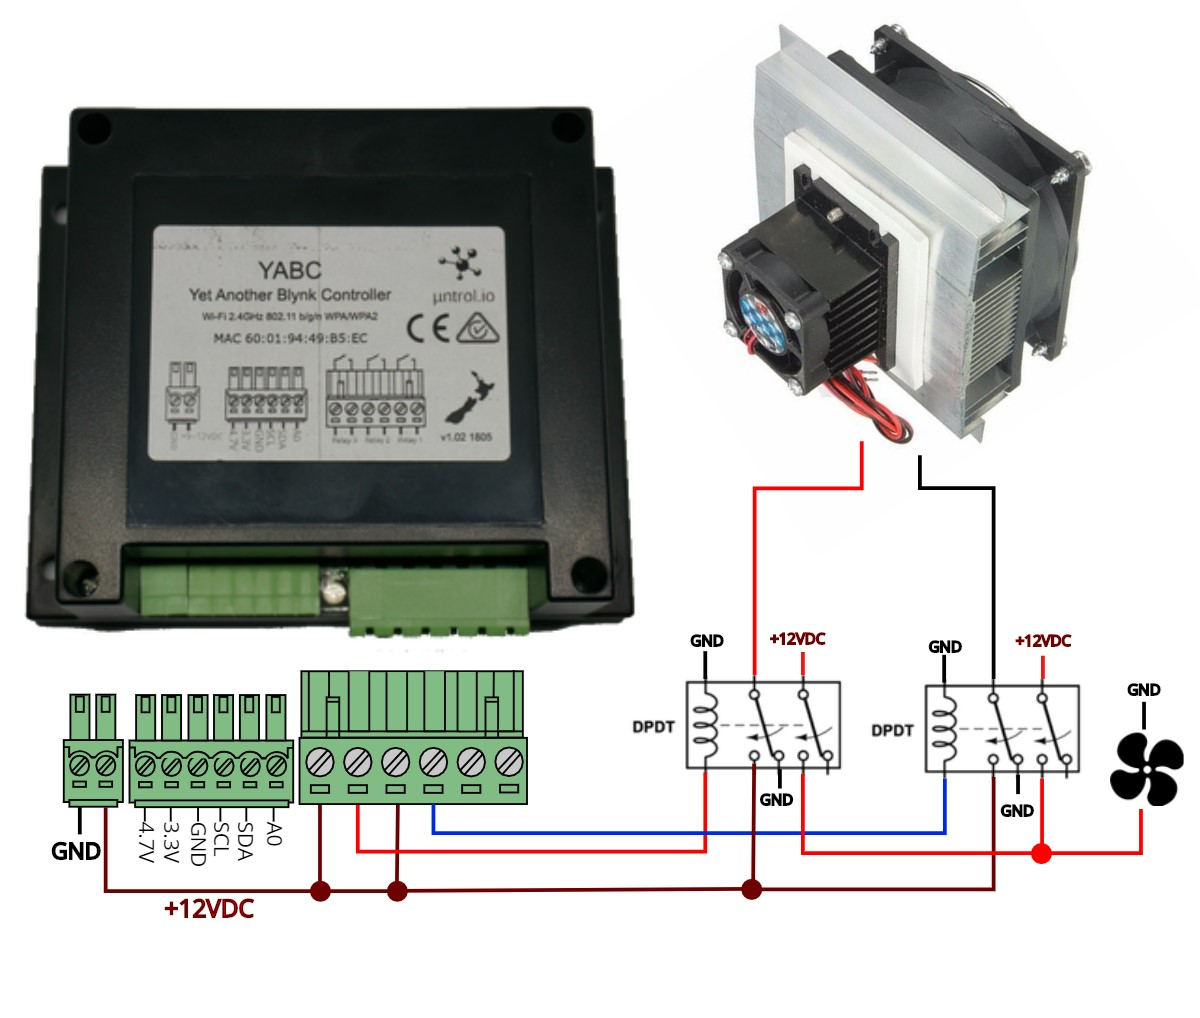 hight resolution of cloud wifi temperature humidity controller blynk yacc esp8266 mushroom wiring jpg1200 1018 149 kb